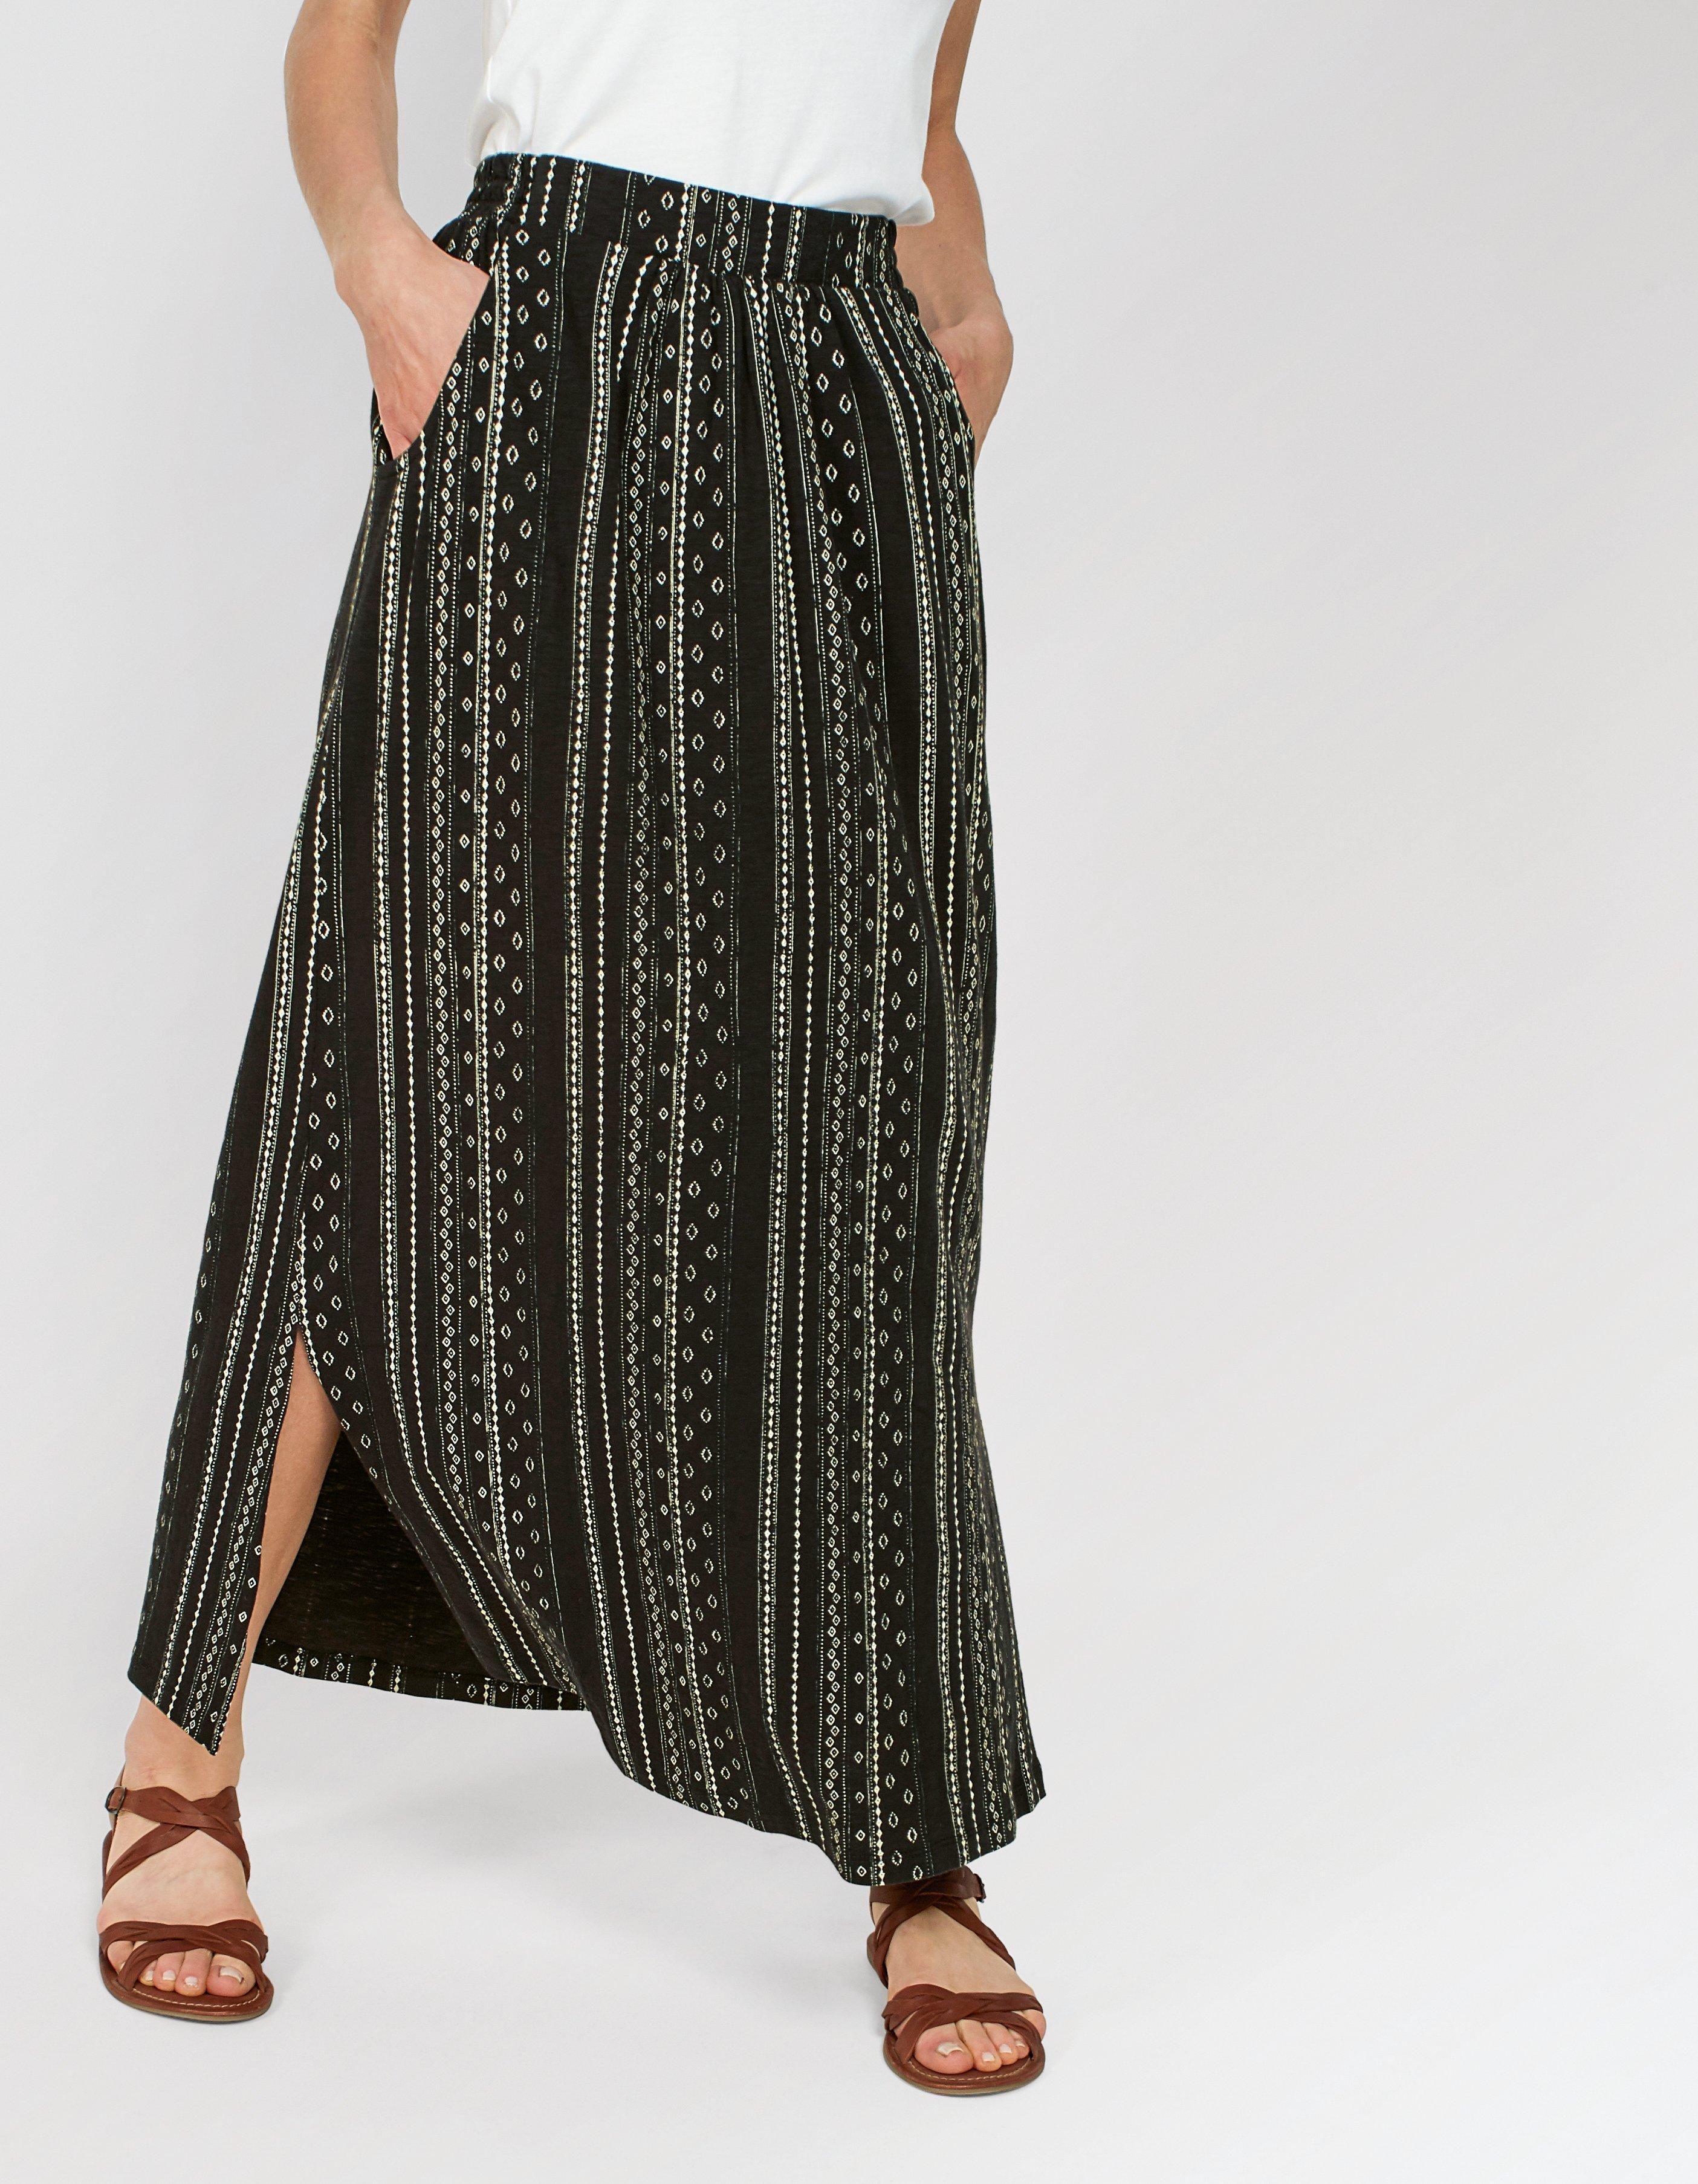 86b3f1cb60 Amber Sketch Stripe Maxi Skirt Striped Maxi Skirts, Sequin Skirt, Fat Face,  Harem